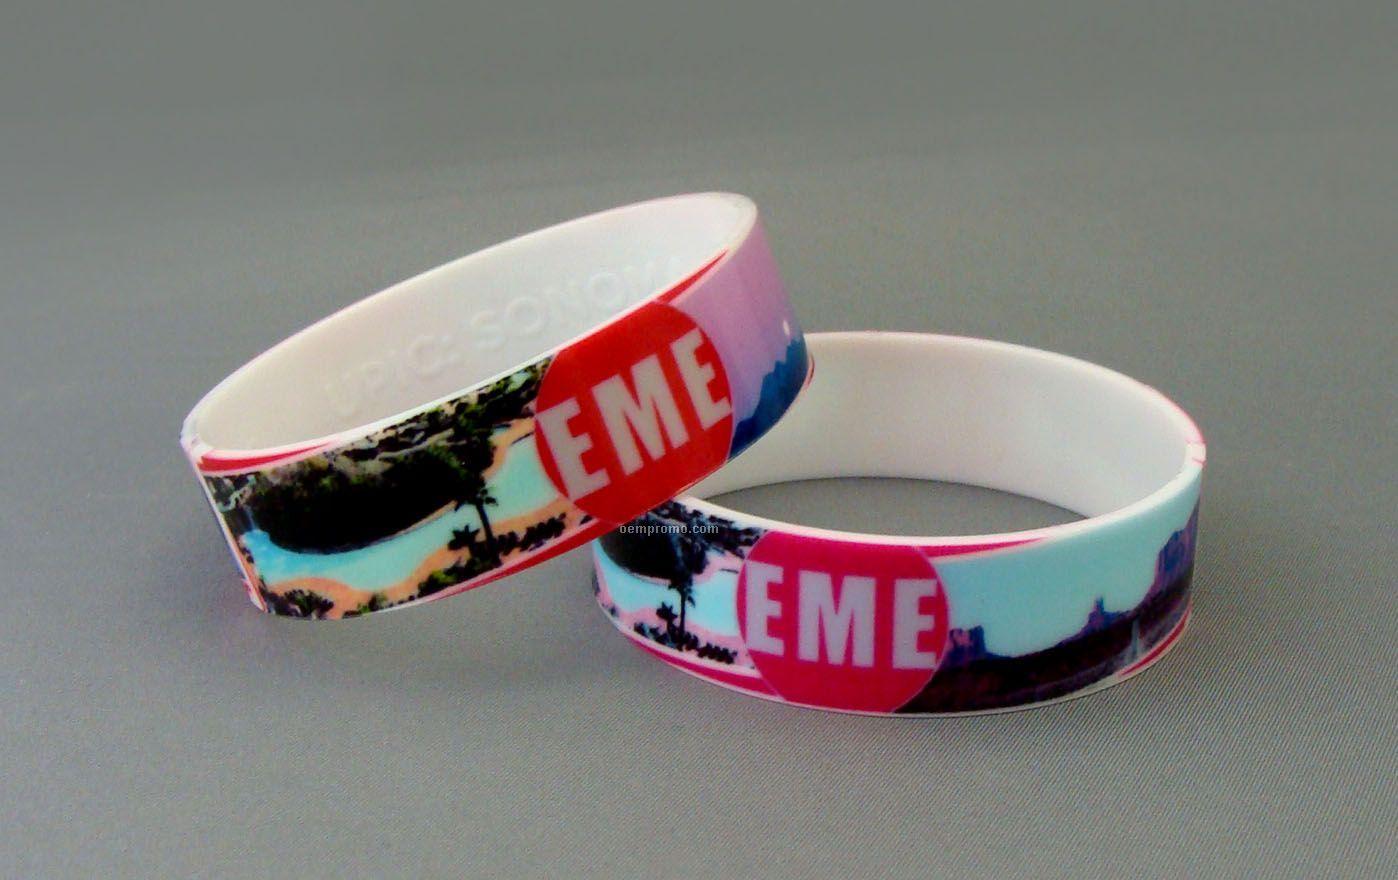 Offset Printed Silicone Bracelet